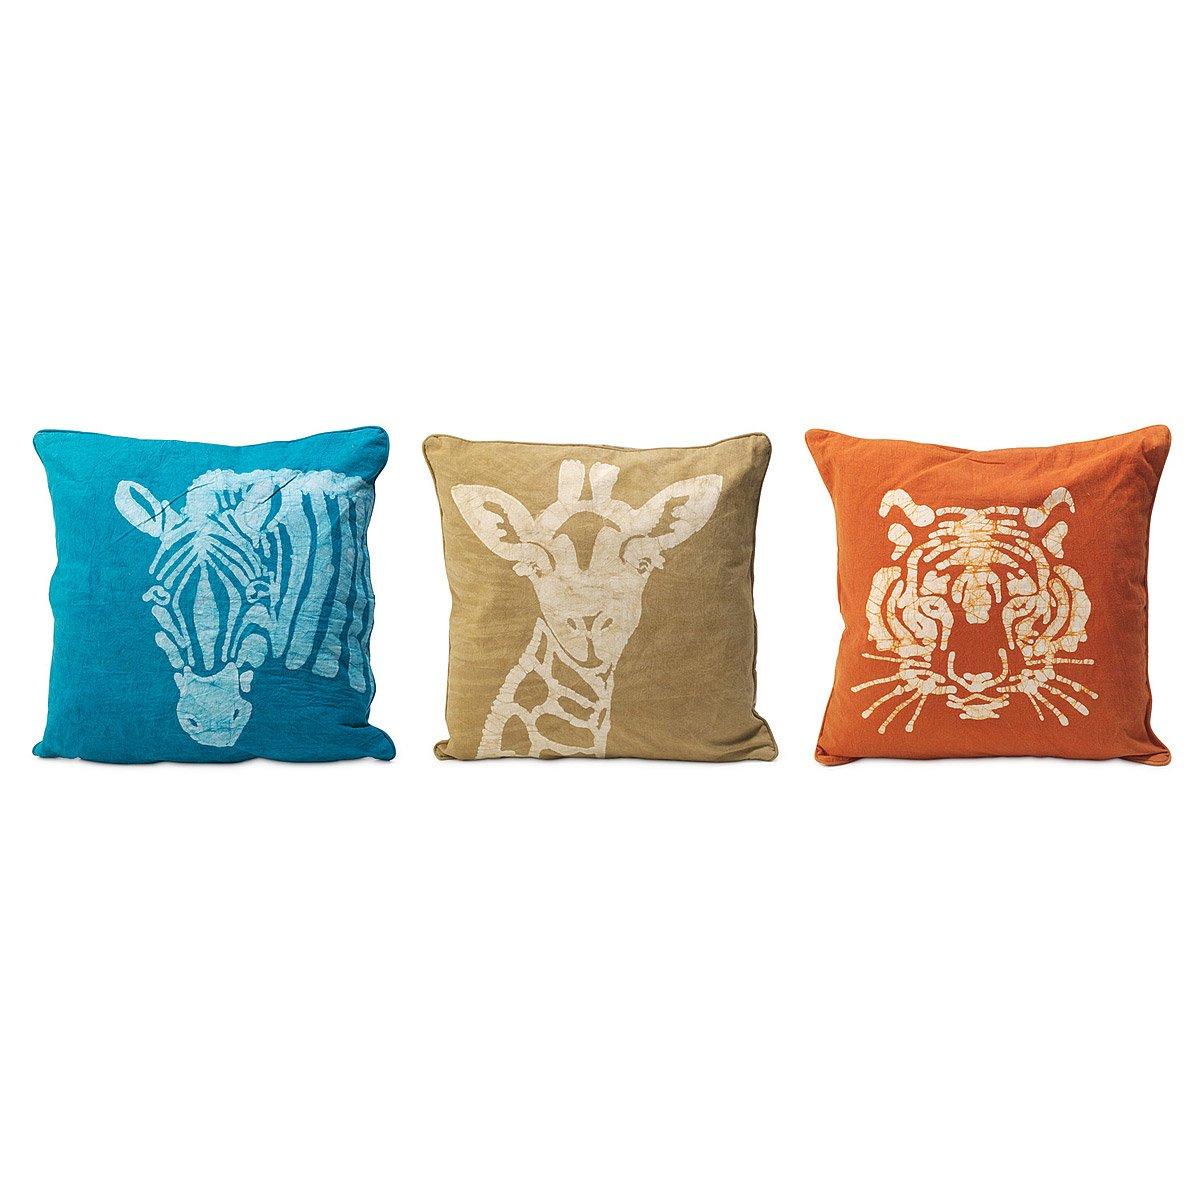 Safari Animal Pillows safari animal pillows home decor